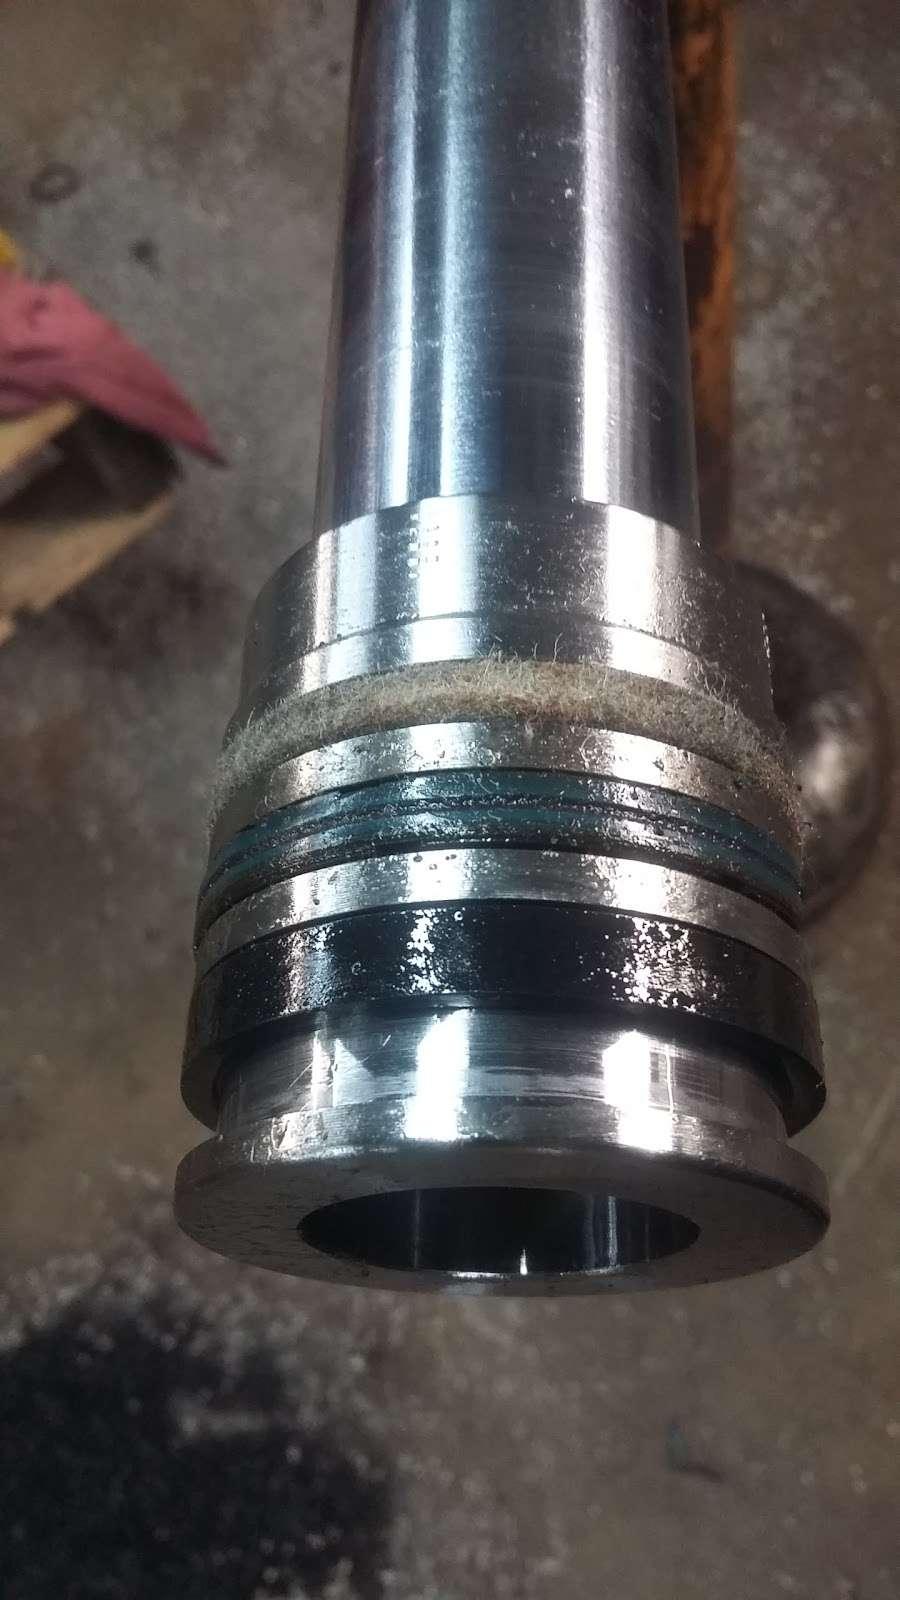 Forklifts & Tires - car repair  | Photo 5 of 9 | Address: 14503 Sommermeyer St, Houston, TX 77041, USA | Phone: (713) 460-8197